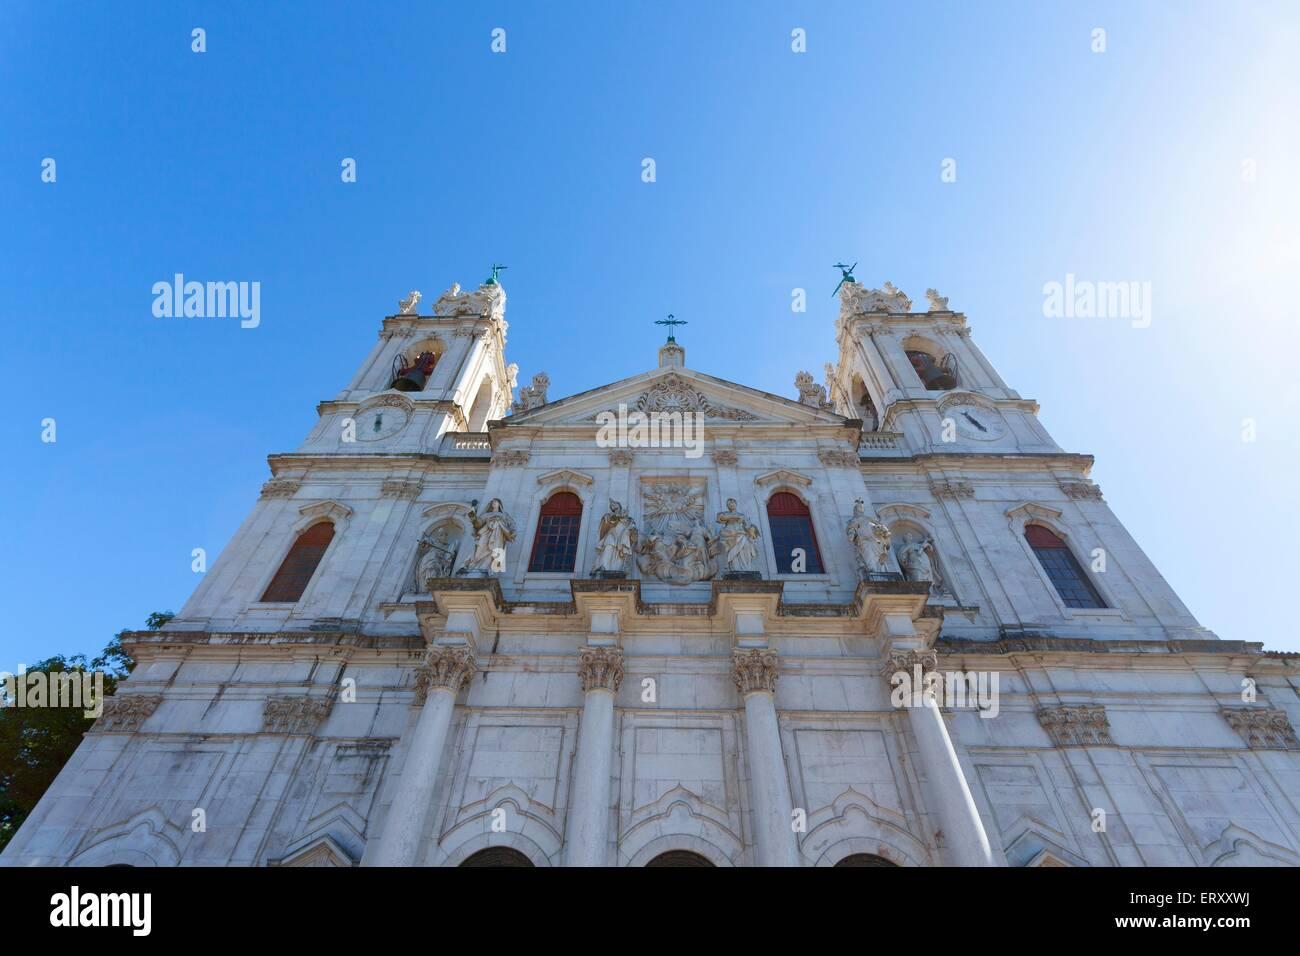 A high angle view of the beautiful Neoclassical Basilica da Estrela, built by Dona Maria I in 1790 in gratitude - Stock Image